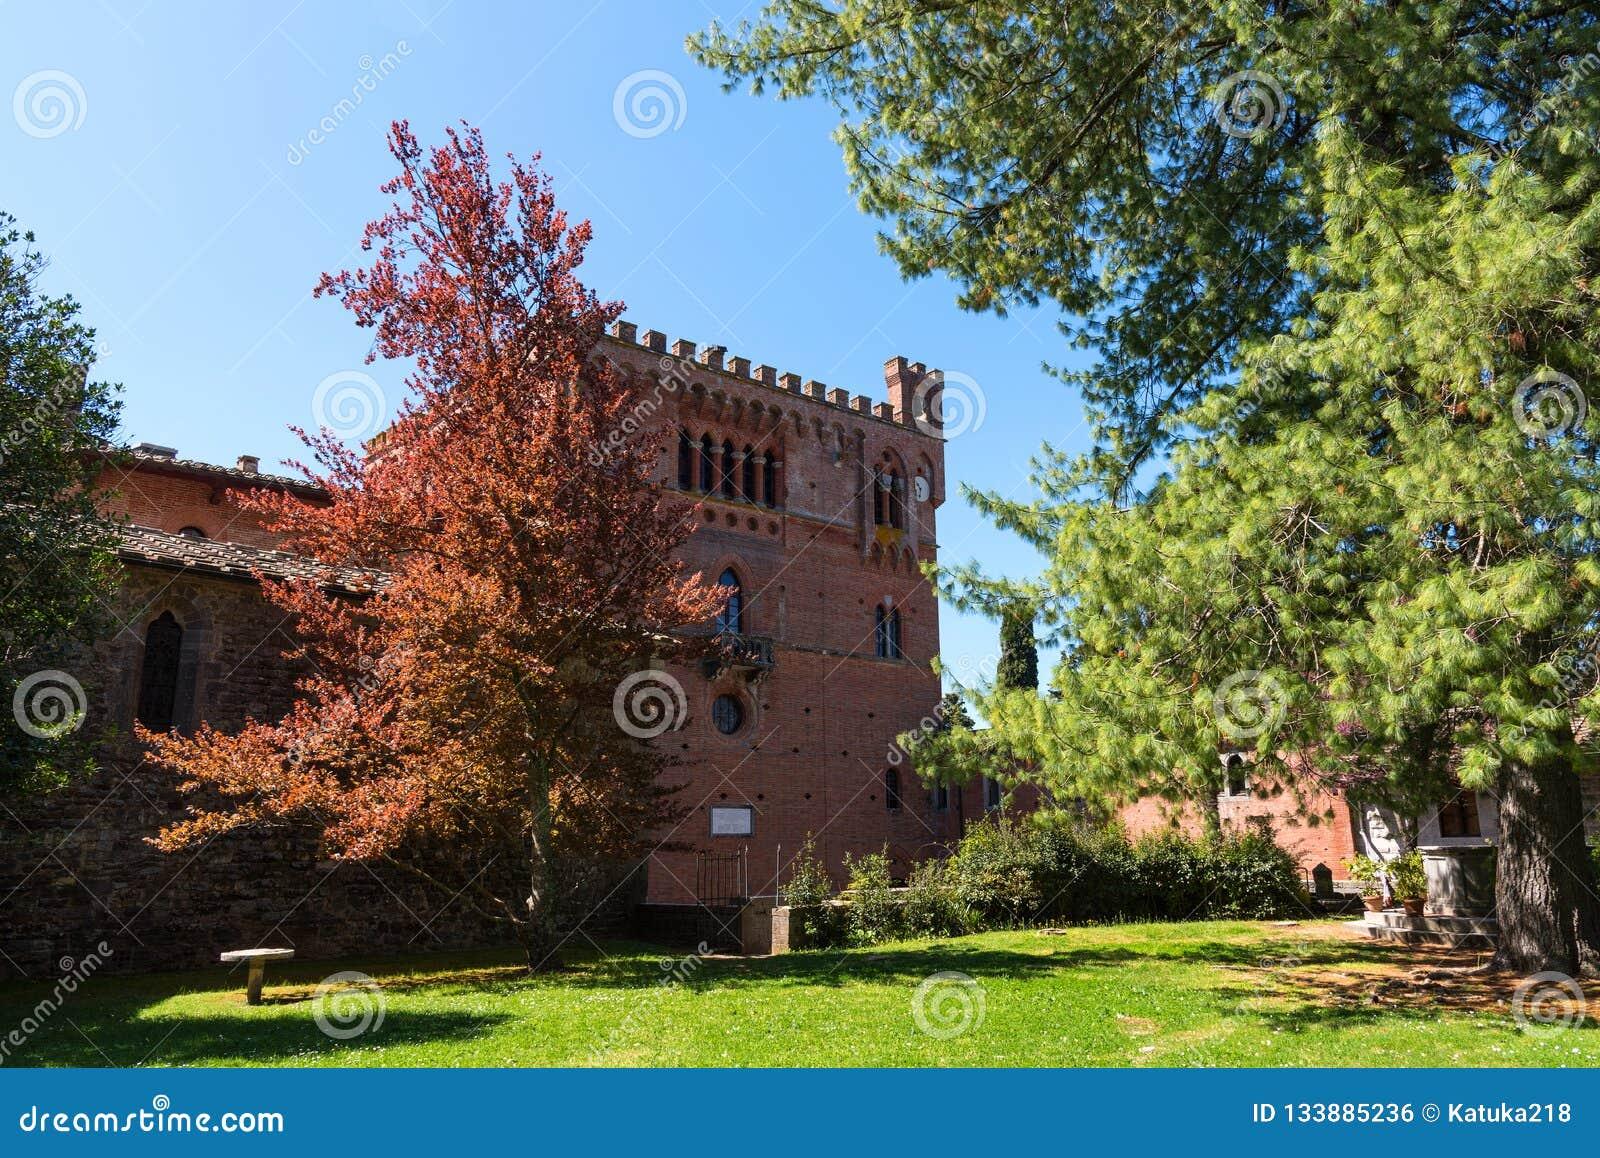 Chianti Region, Italy - April 21, 2018: Castello di Brolio, a rural castle, palace and gardens, near Siena, region of Tuscany,